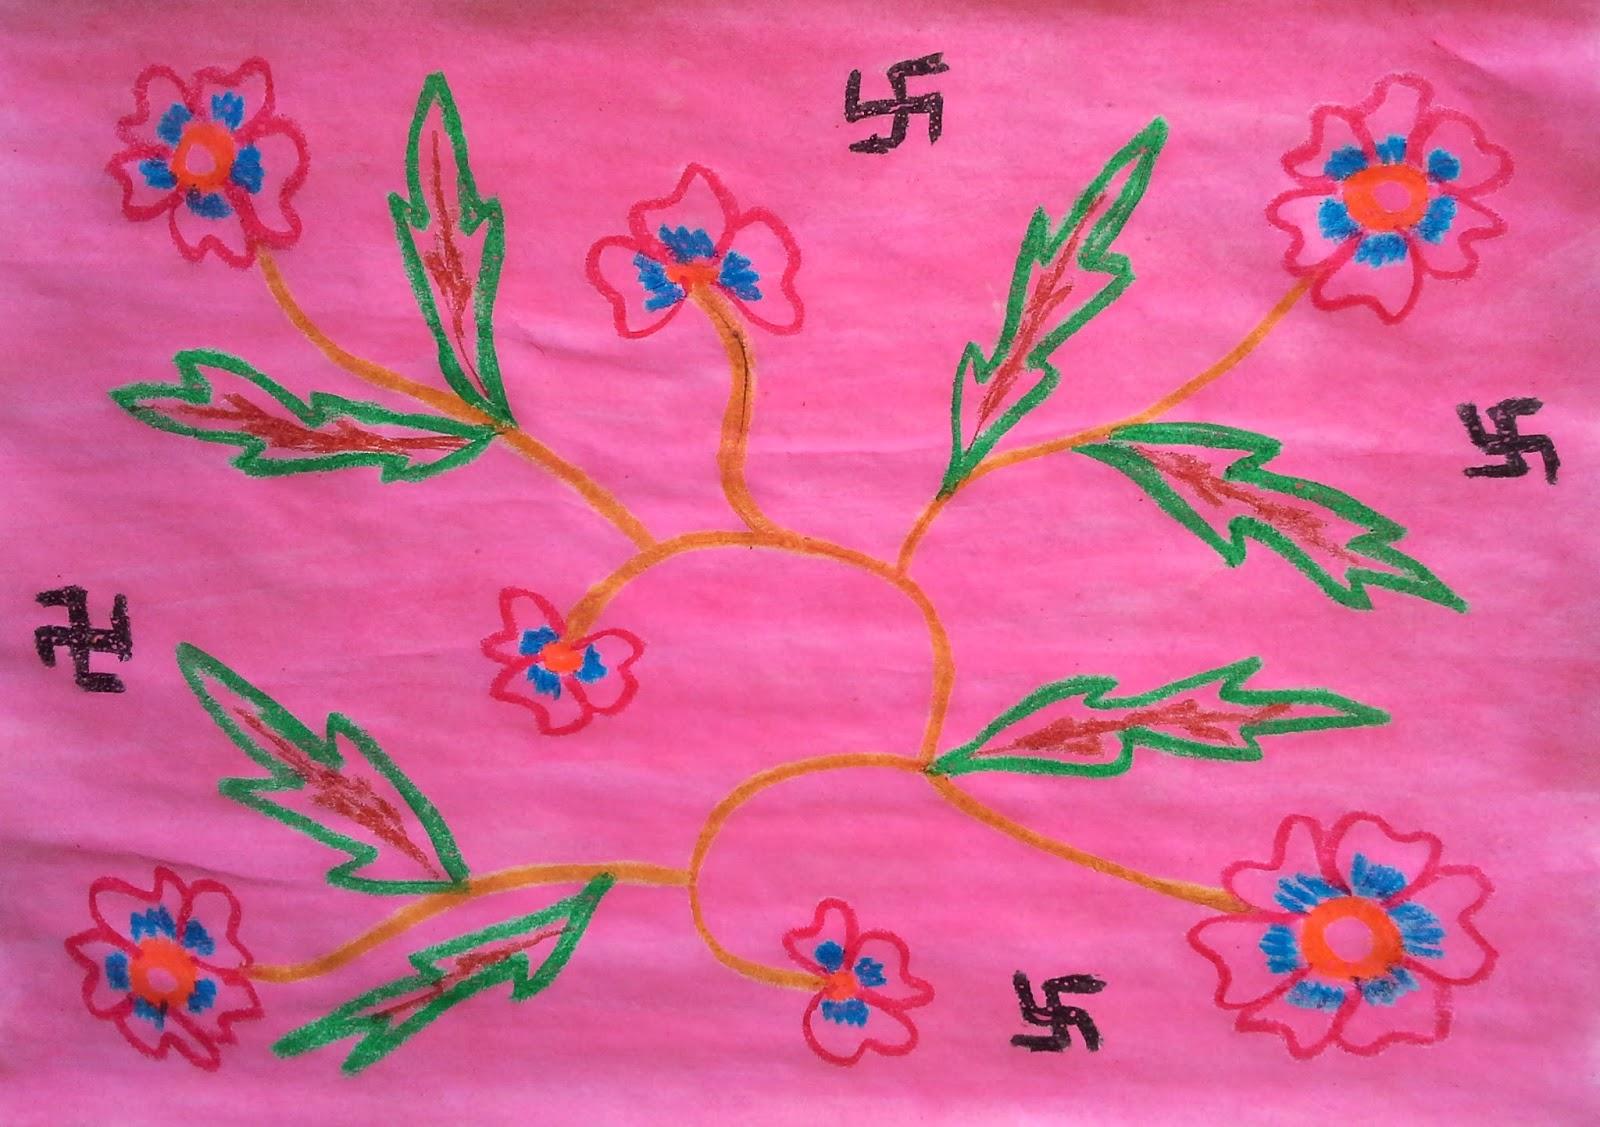 29+ Gambar Batik Sederhana Anak Sd, Yang Banyak Di Cari!